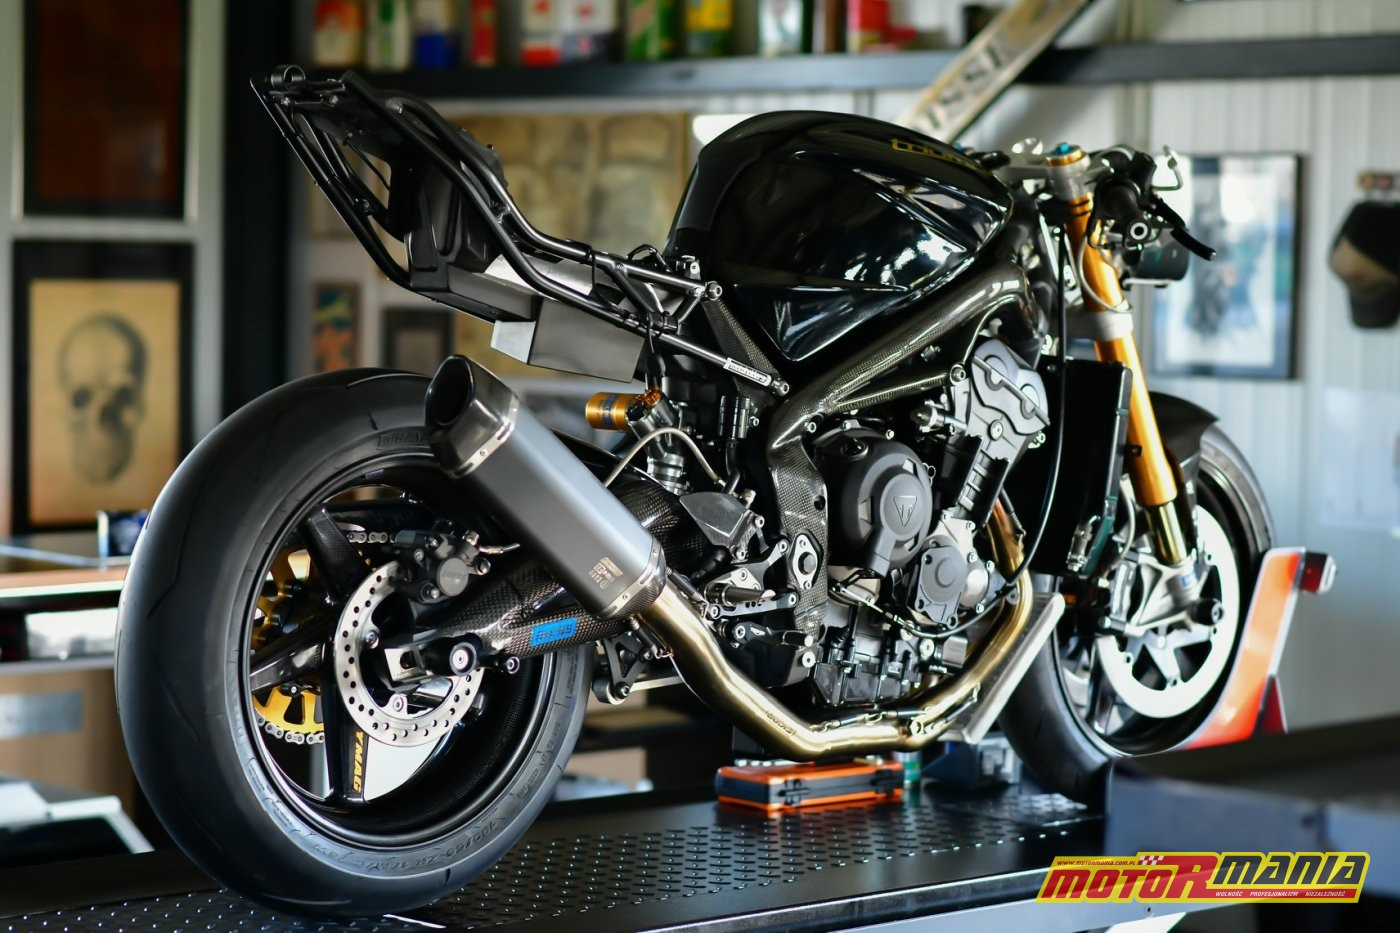 daytona 765 moto2 m-meca bike 31 (2)